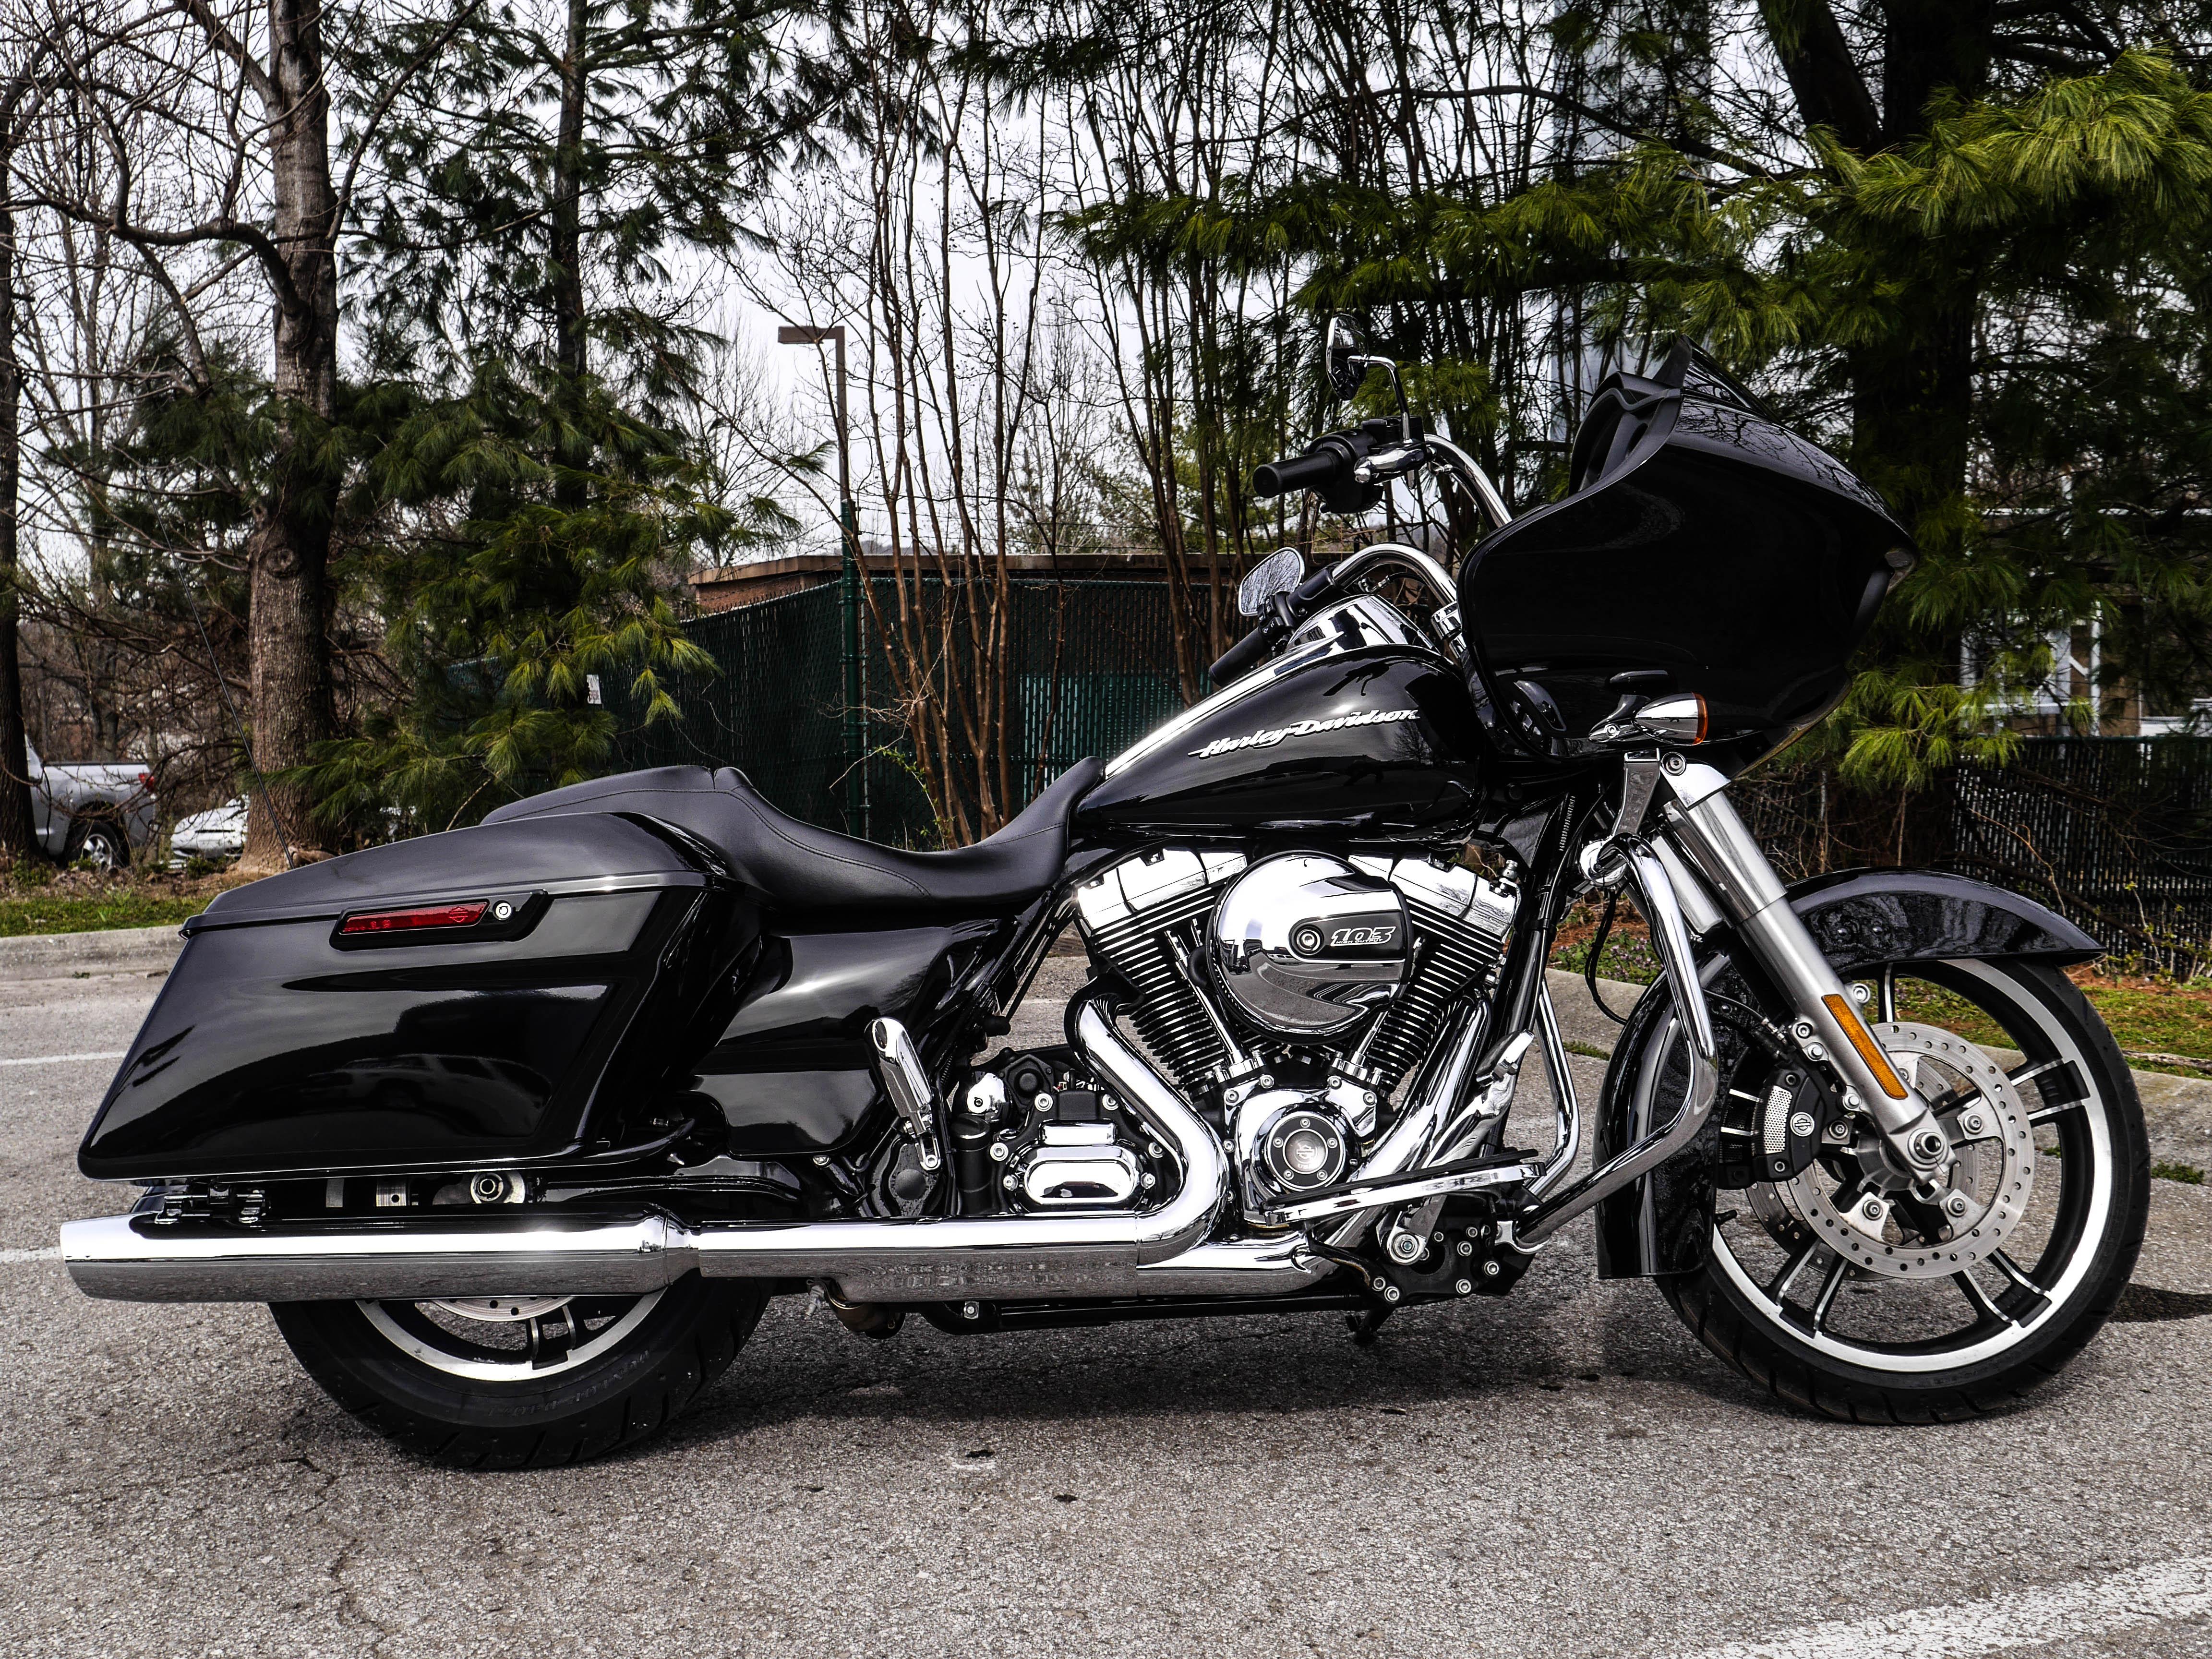 Pre-Owned 2016 Harley-Davidson Touring Road Glide Custom